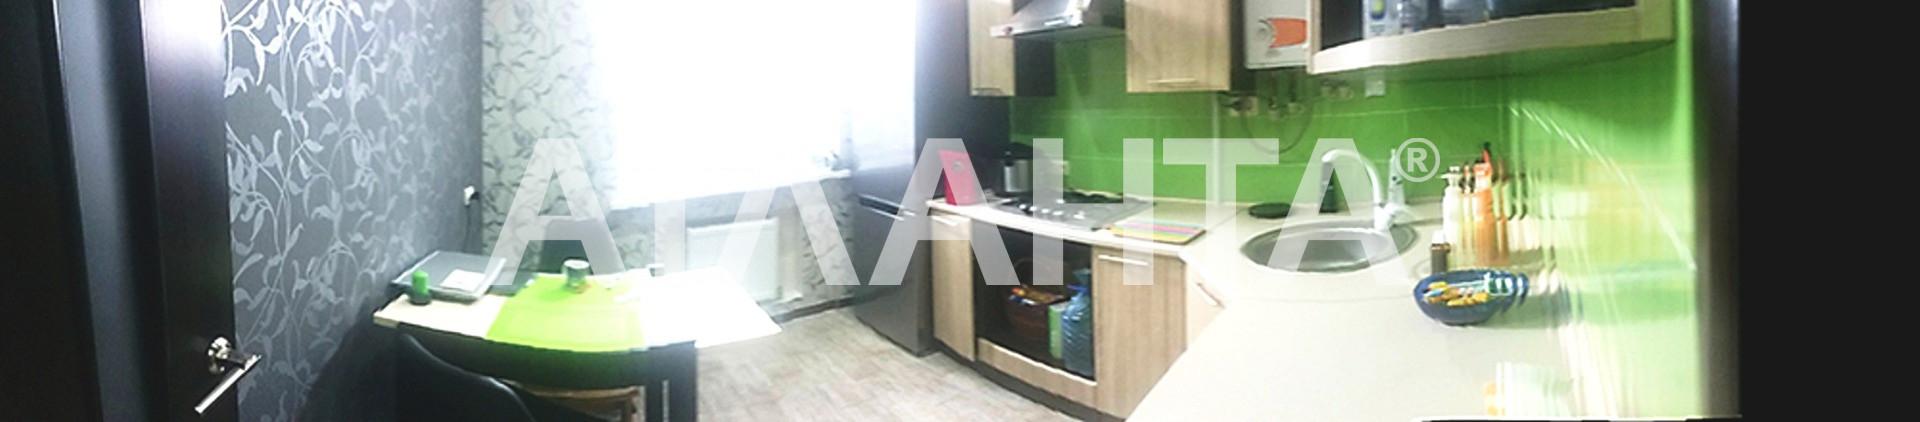 Продается 1-комнатная Квартира на ул. Крупской — 21 000 у.е. (фото №6)